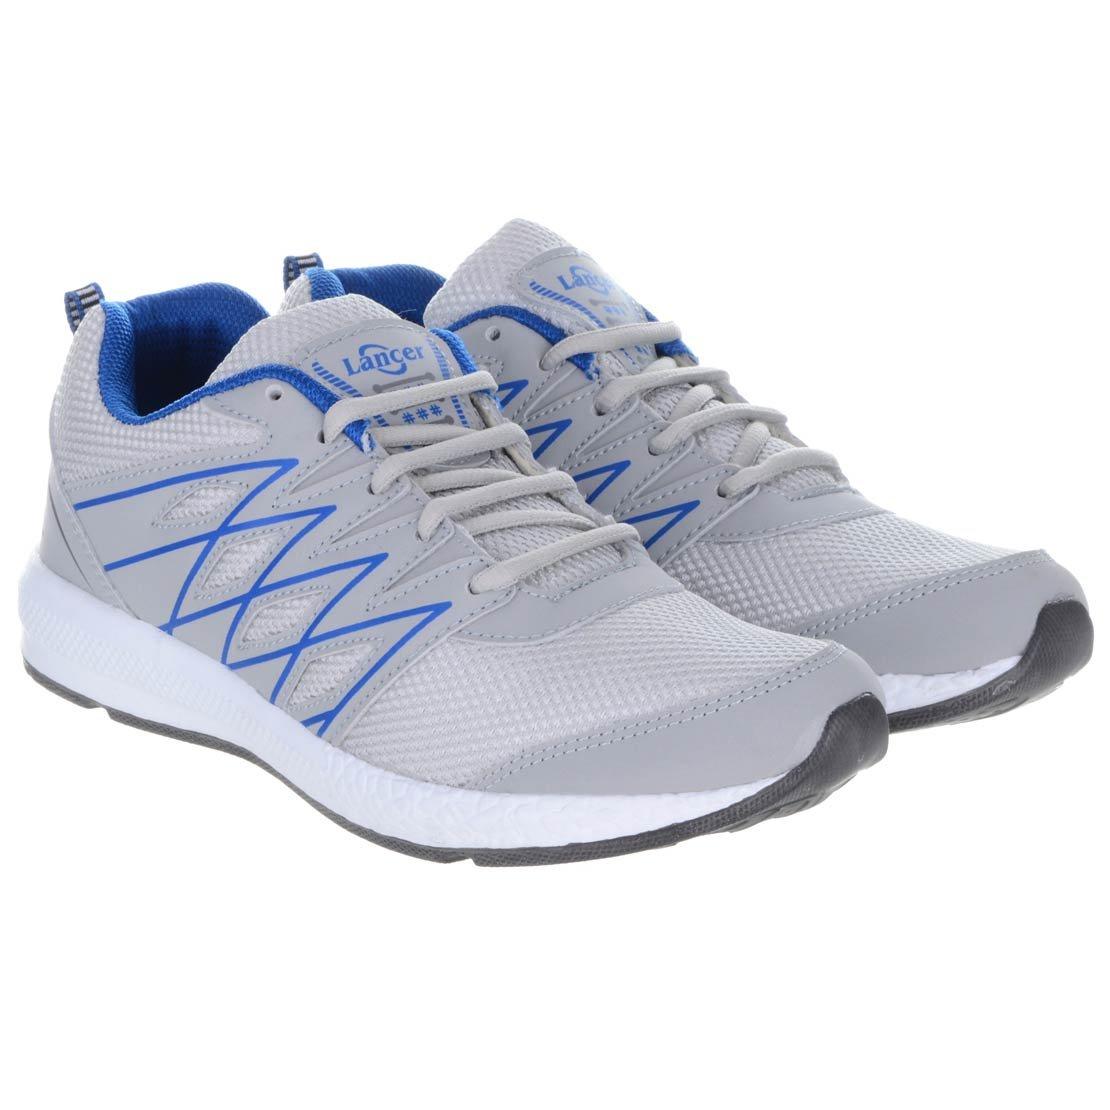 Lancer Mens Sports Shoe Grey Blue Mesh 8 UK image 1